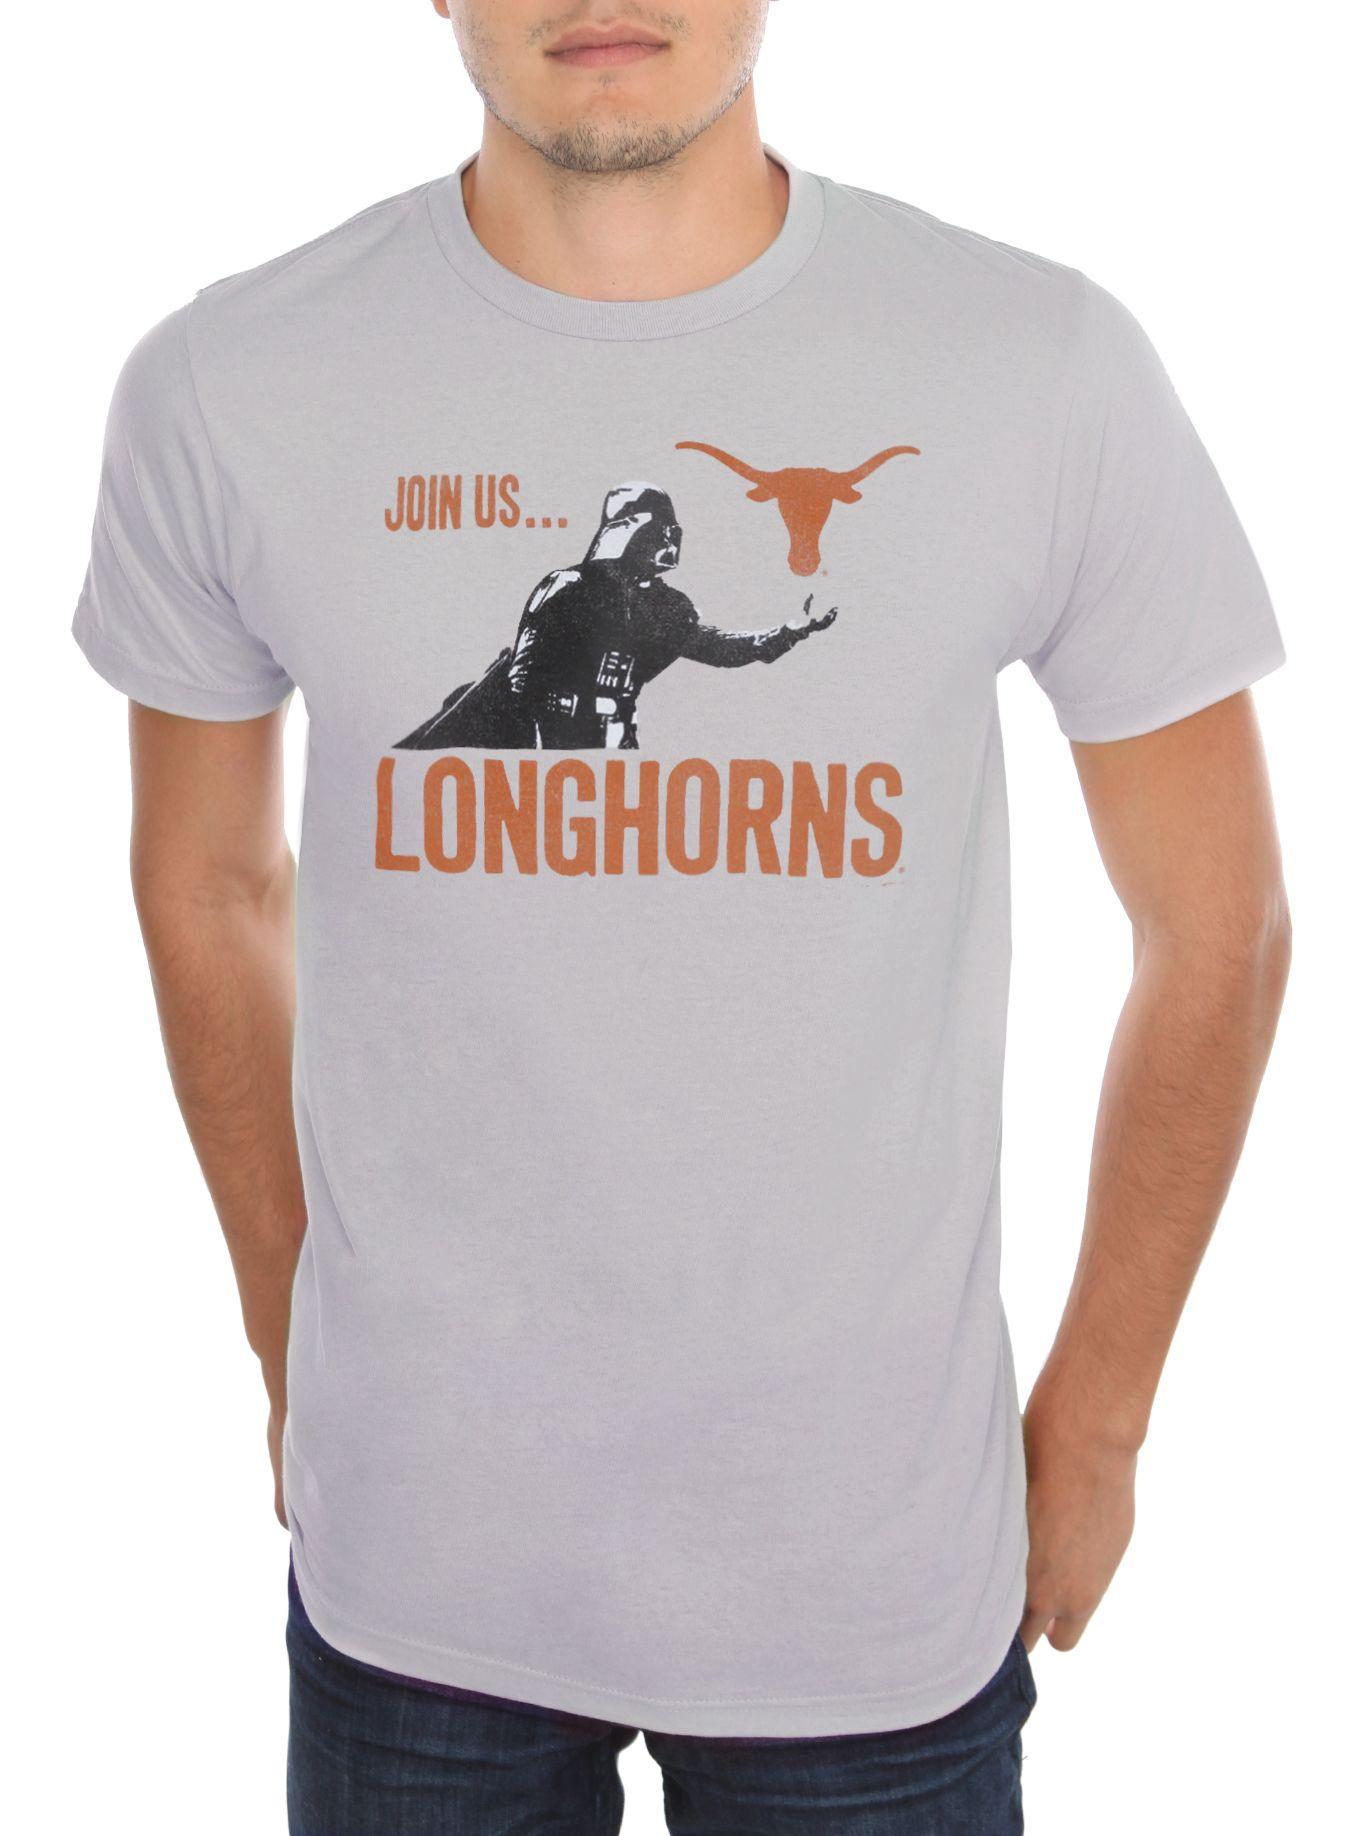 Shirt design killeen tx - Star Wars Ncaa Texas Darth Vader T Shirt Hot Topic